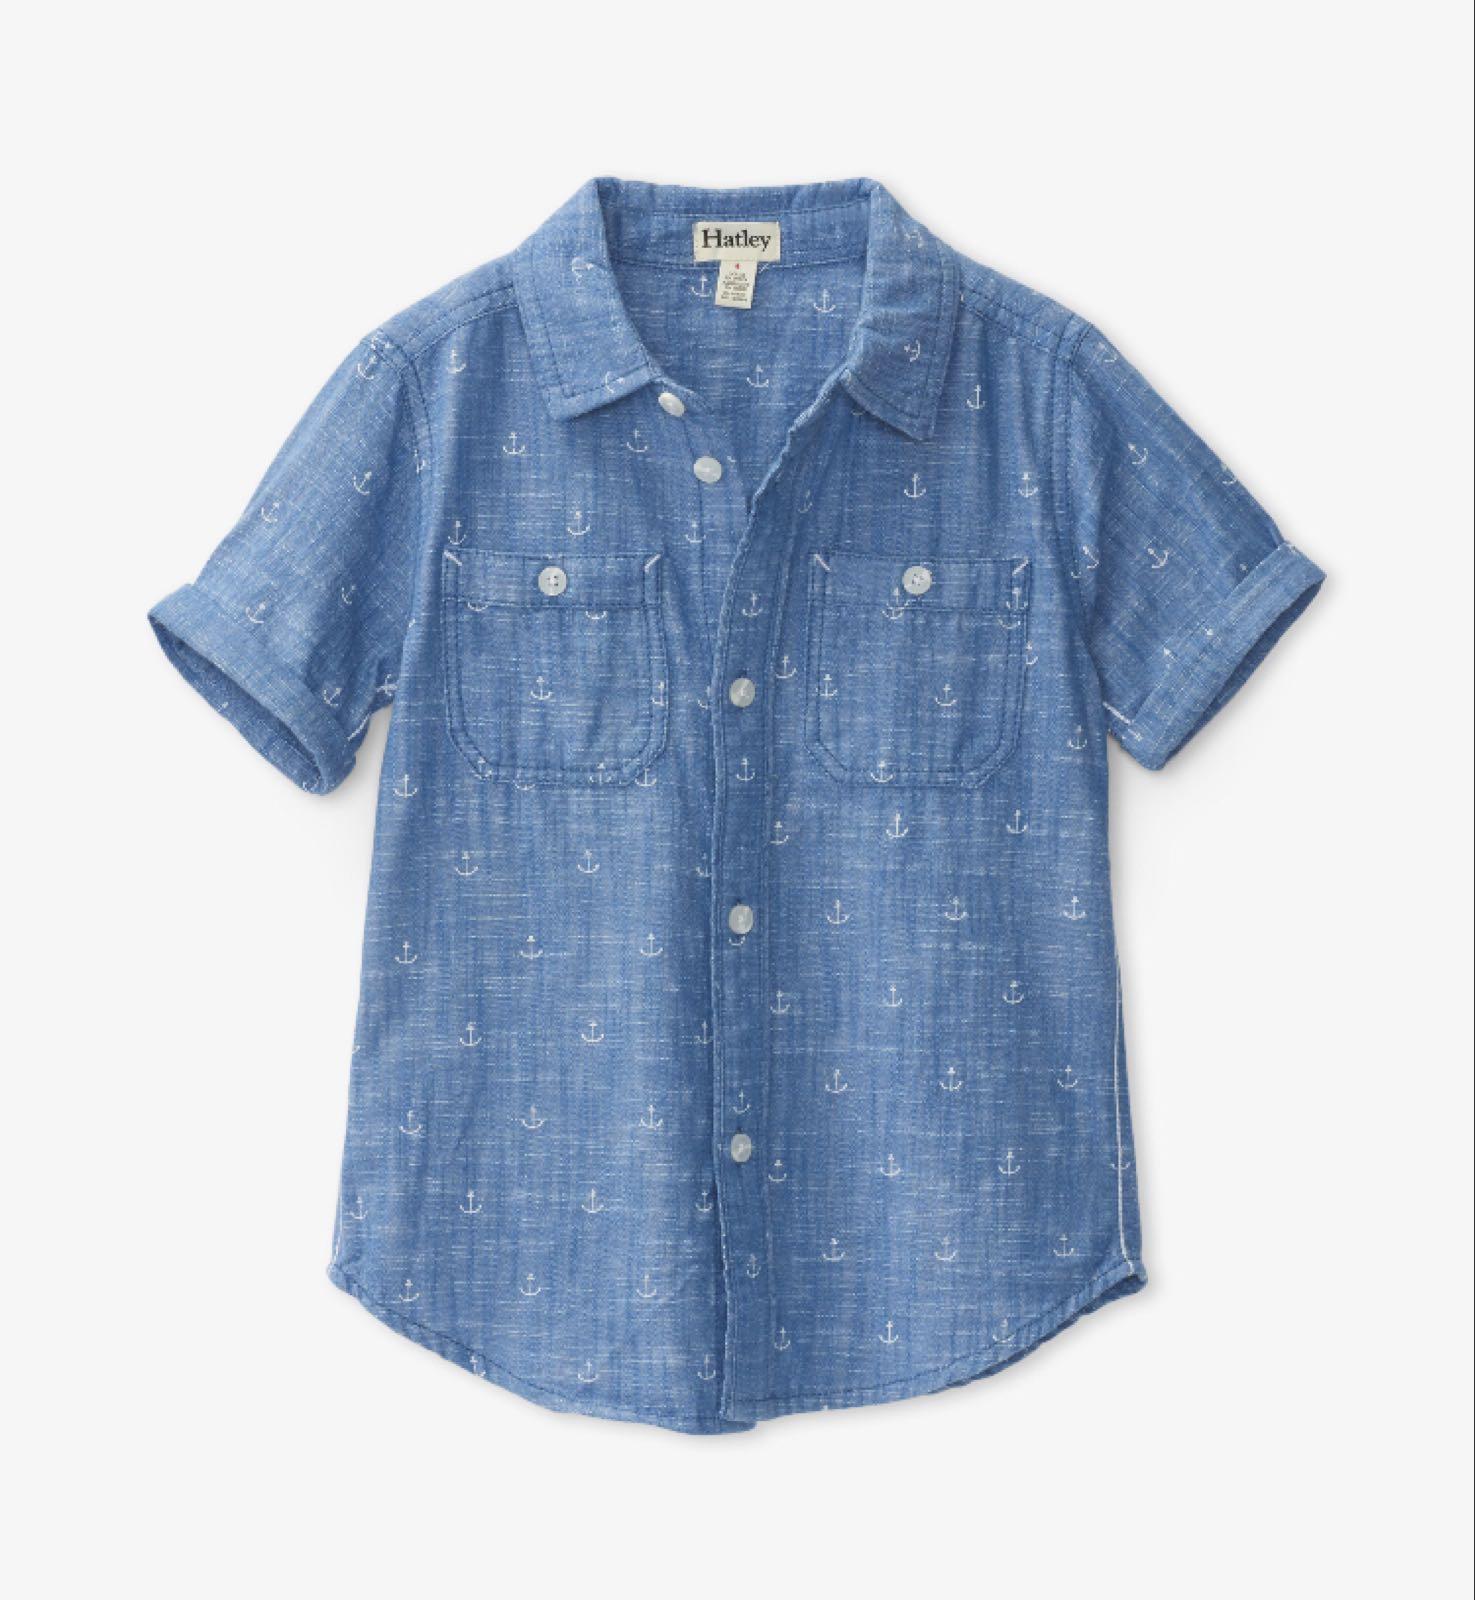 Hatley Chambray Anchors Short Sleeve Button Down Shirt